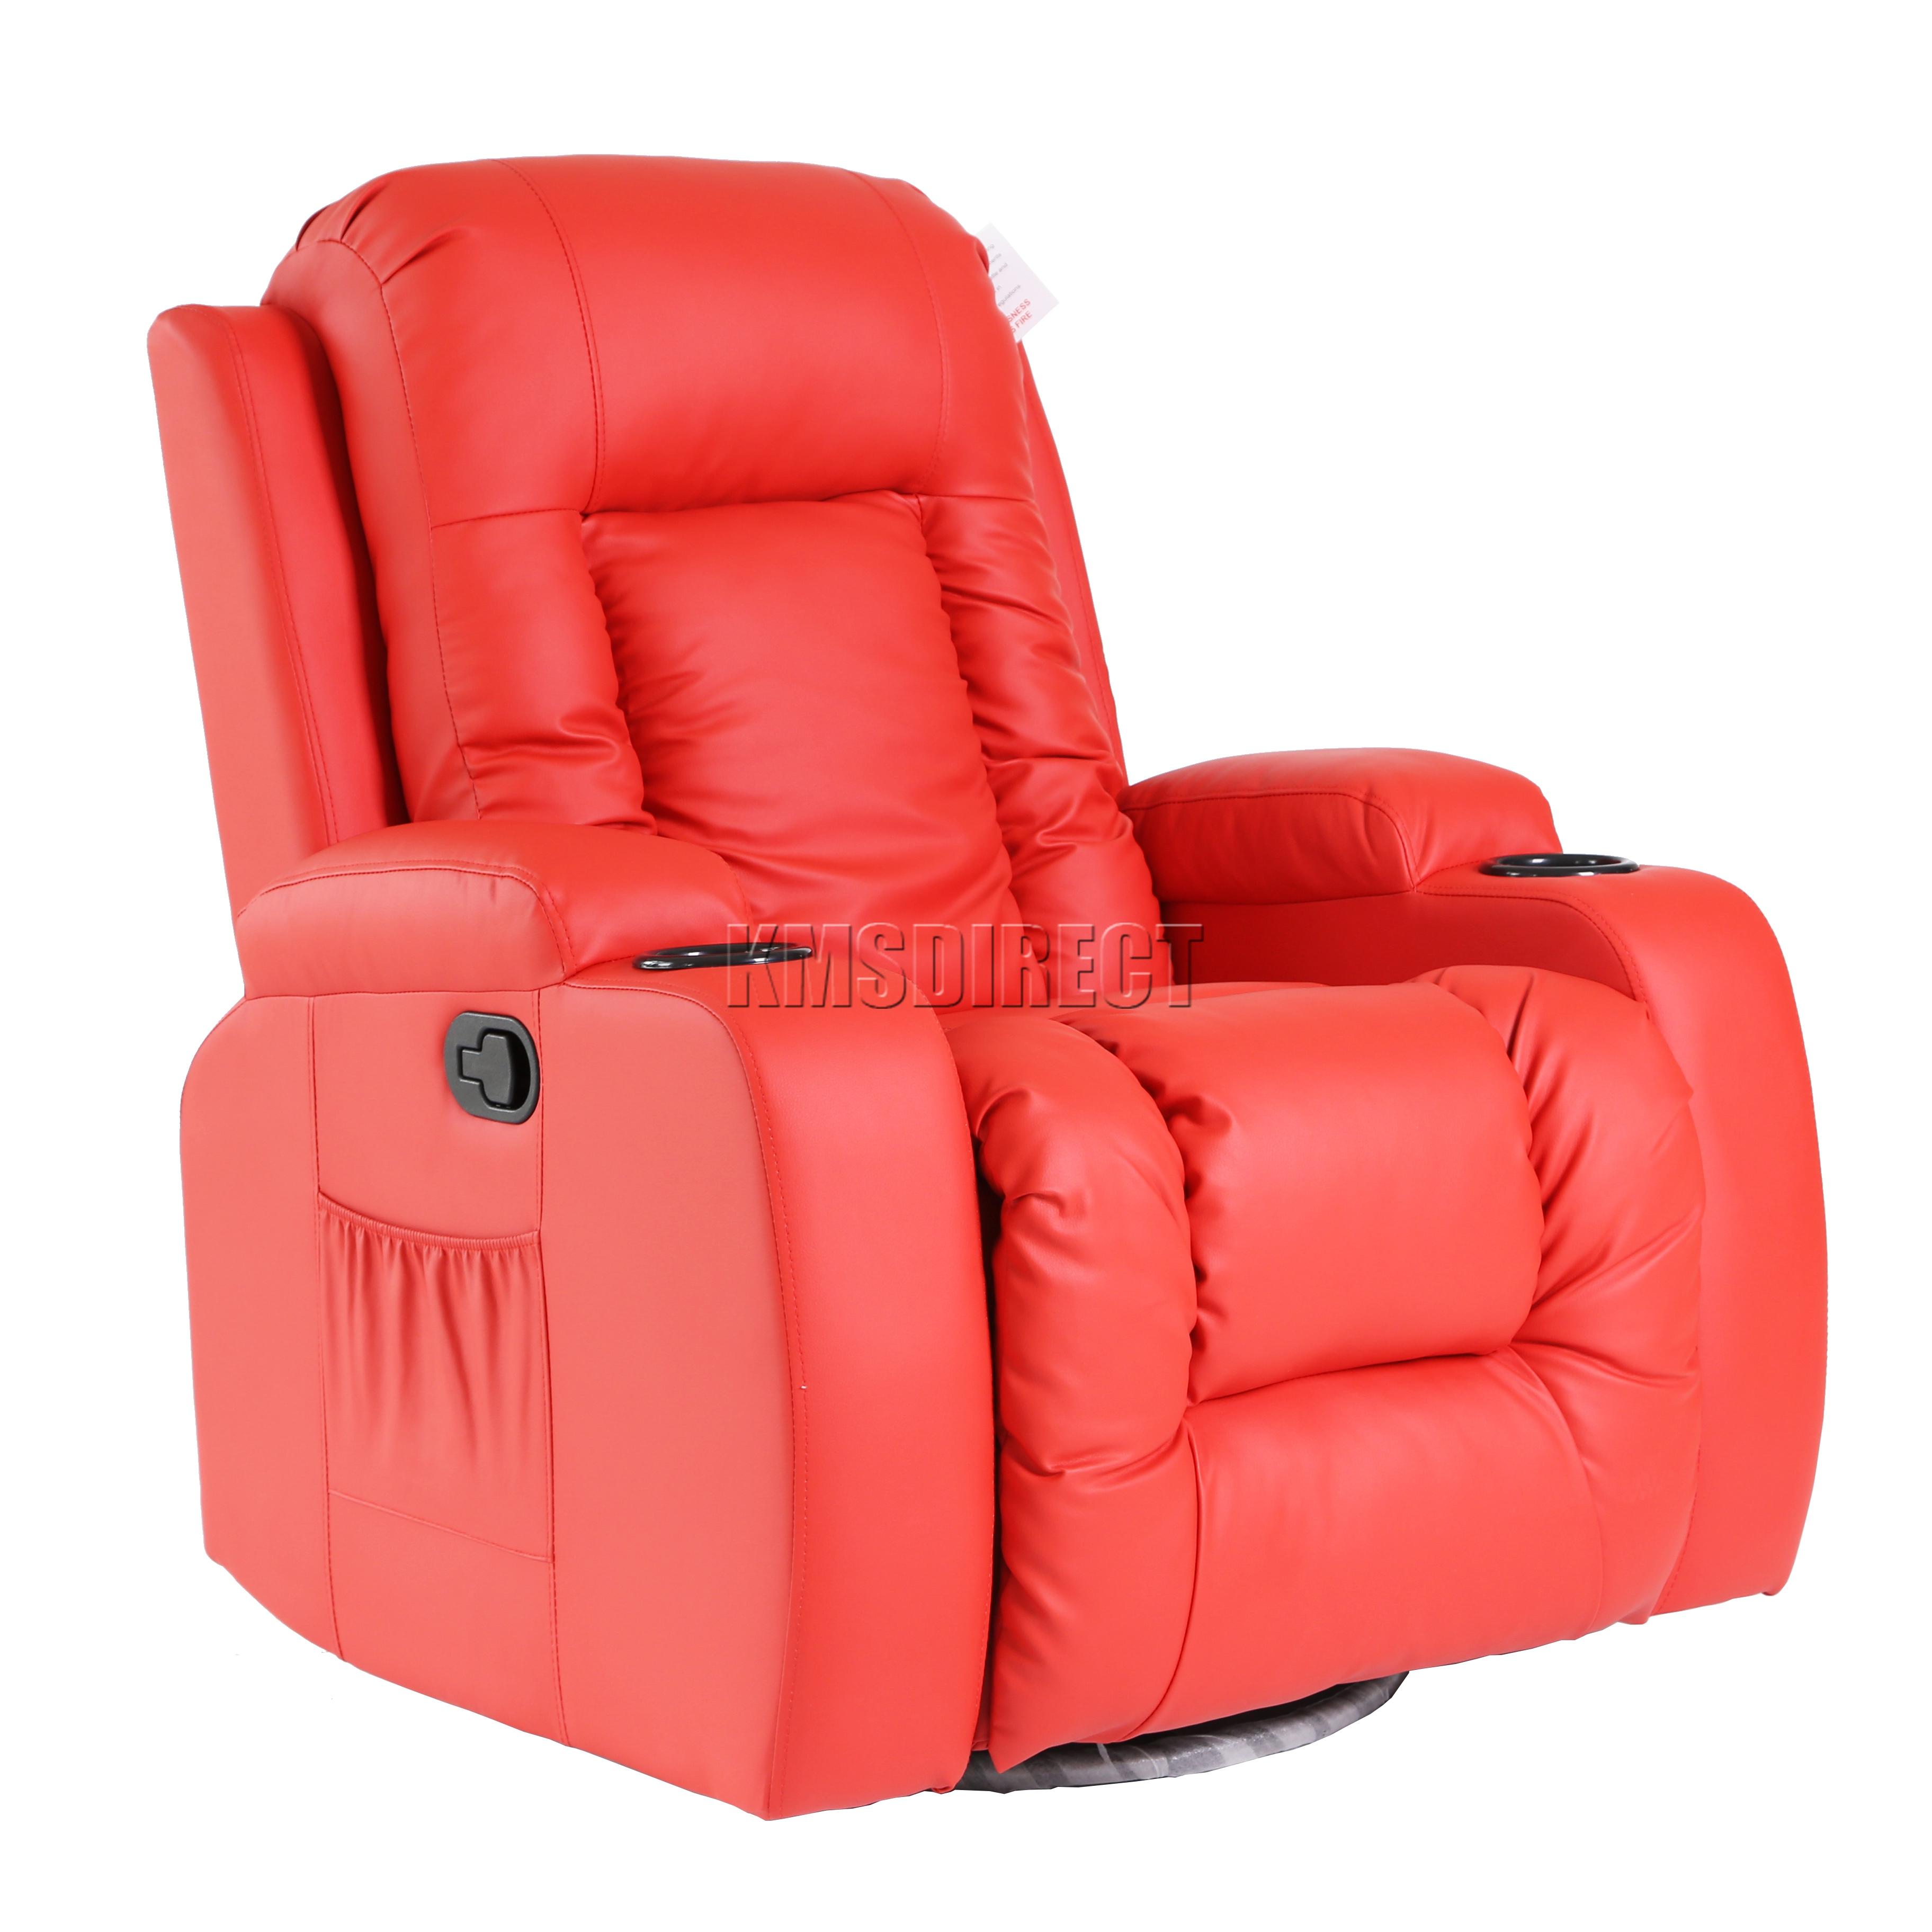 luxury leather sofa chair new tatsuyoru